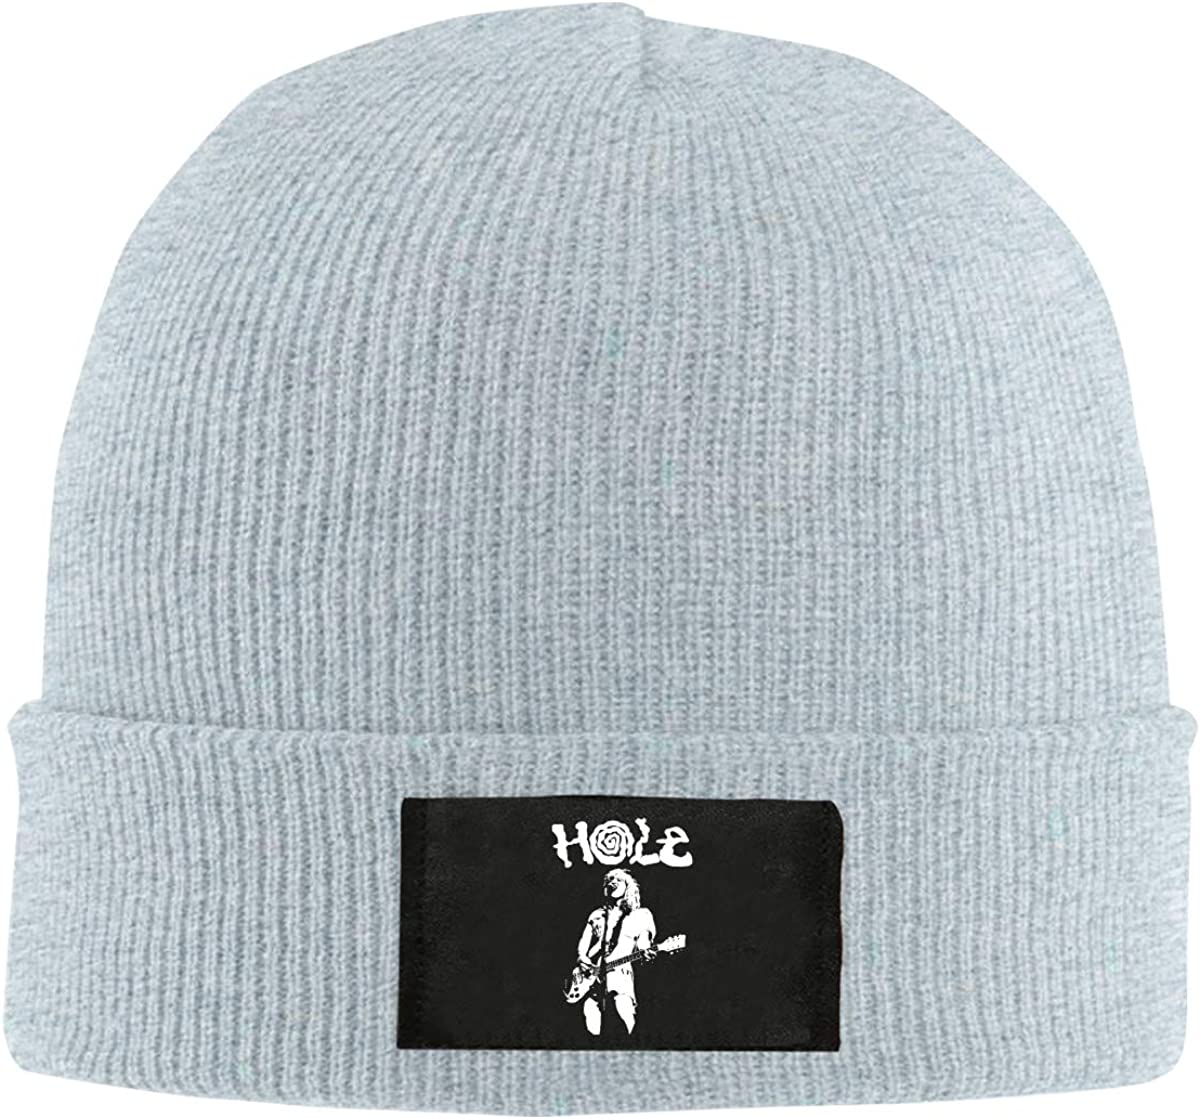 Courtney Love Hole Pretty On The Inside Knit Beanie Cap Warm Sozy Unisex Classic Hat Black